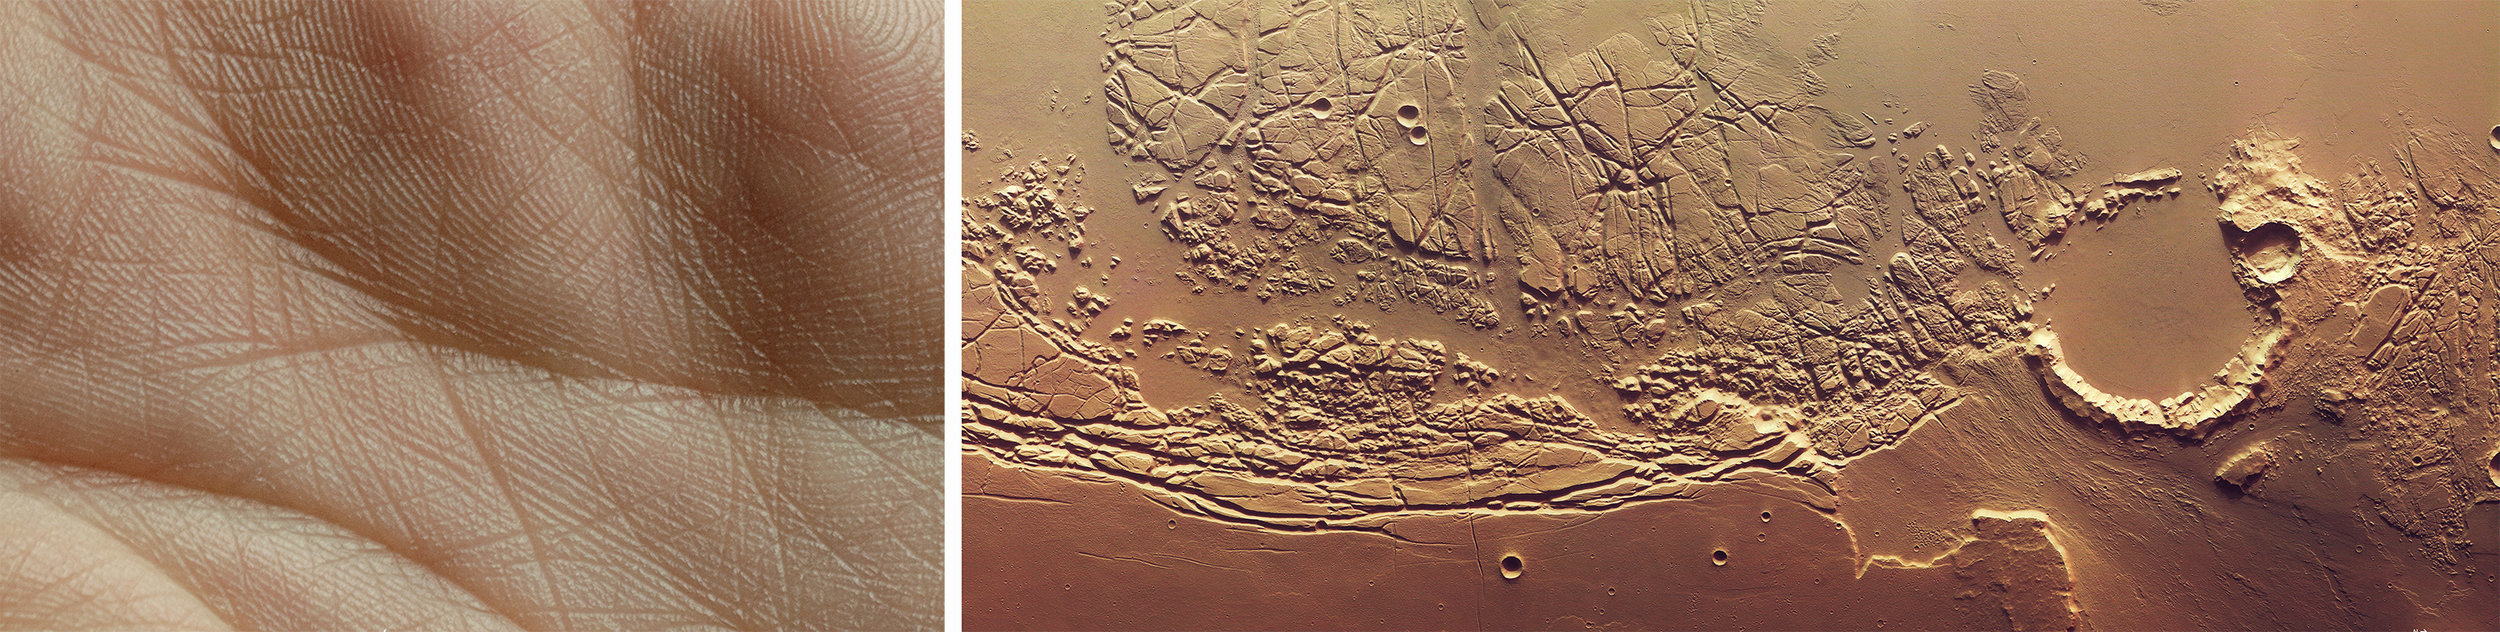 Marina-Fridman-Mars